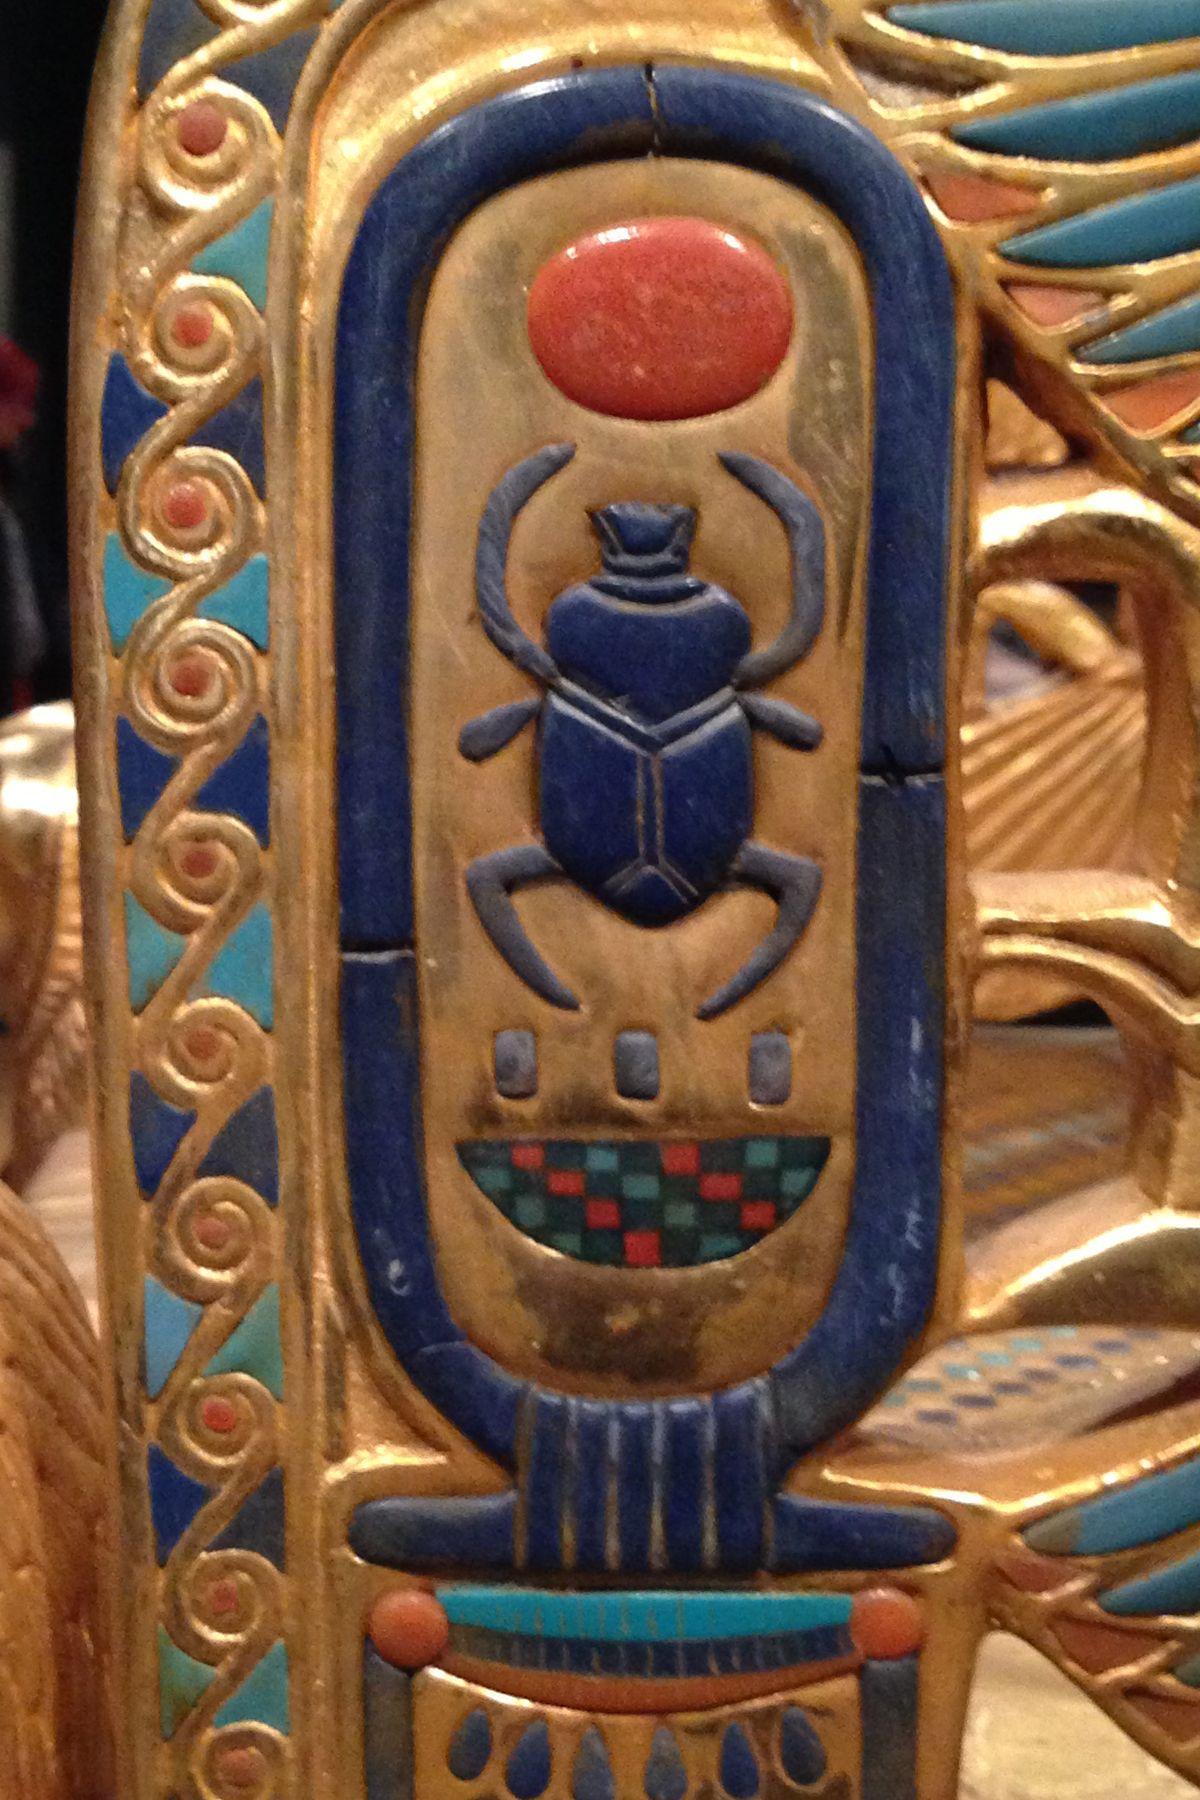 Meaning of fourth - Kings Tutankhamun S Fourth Name Throne Name Neb Kheperu Ra Meaning